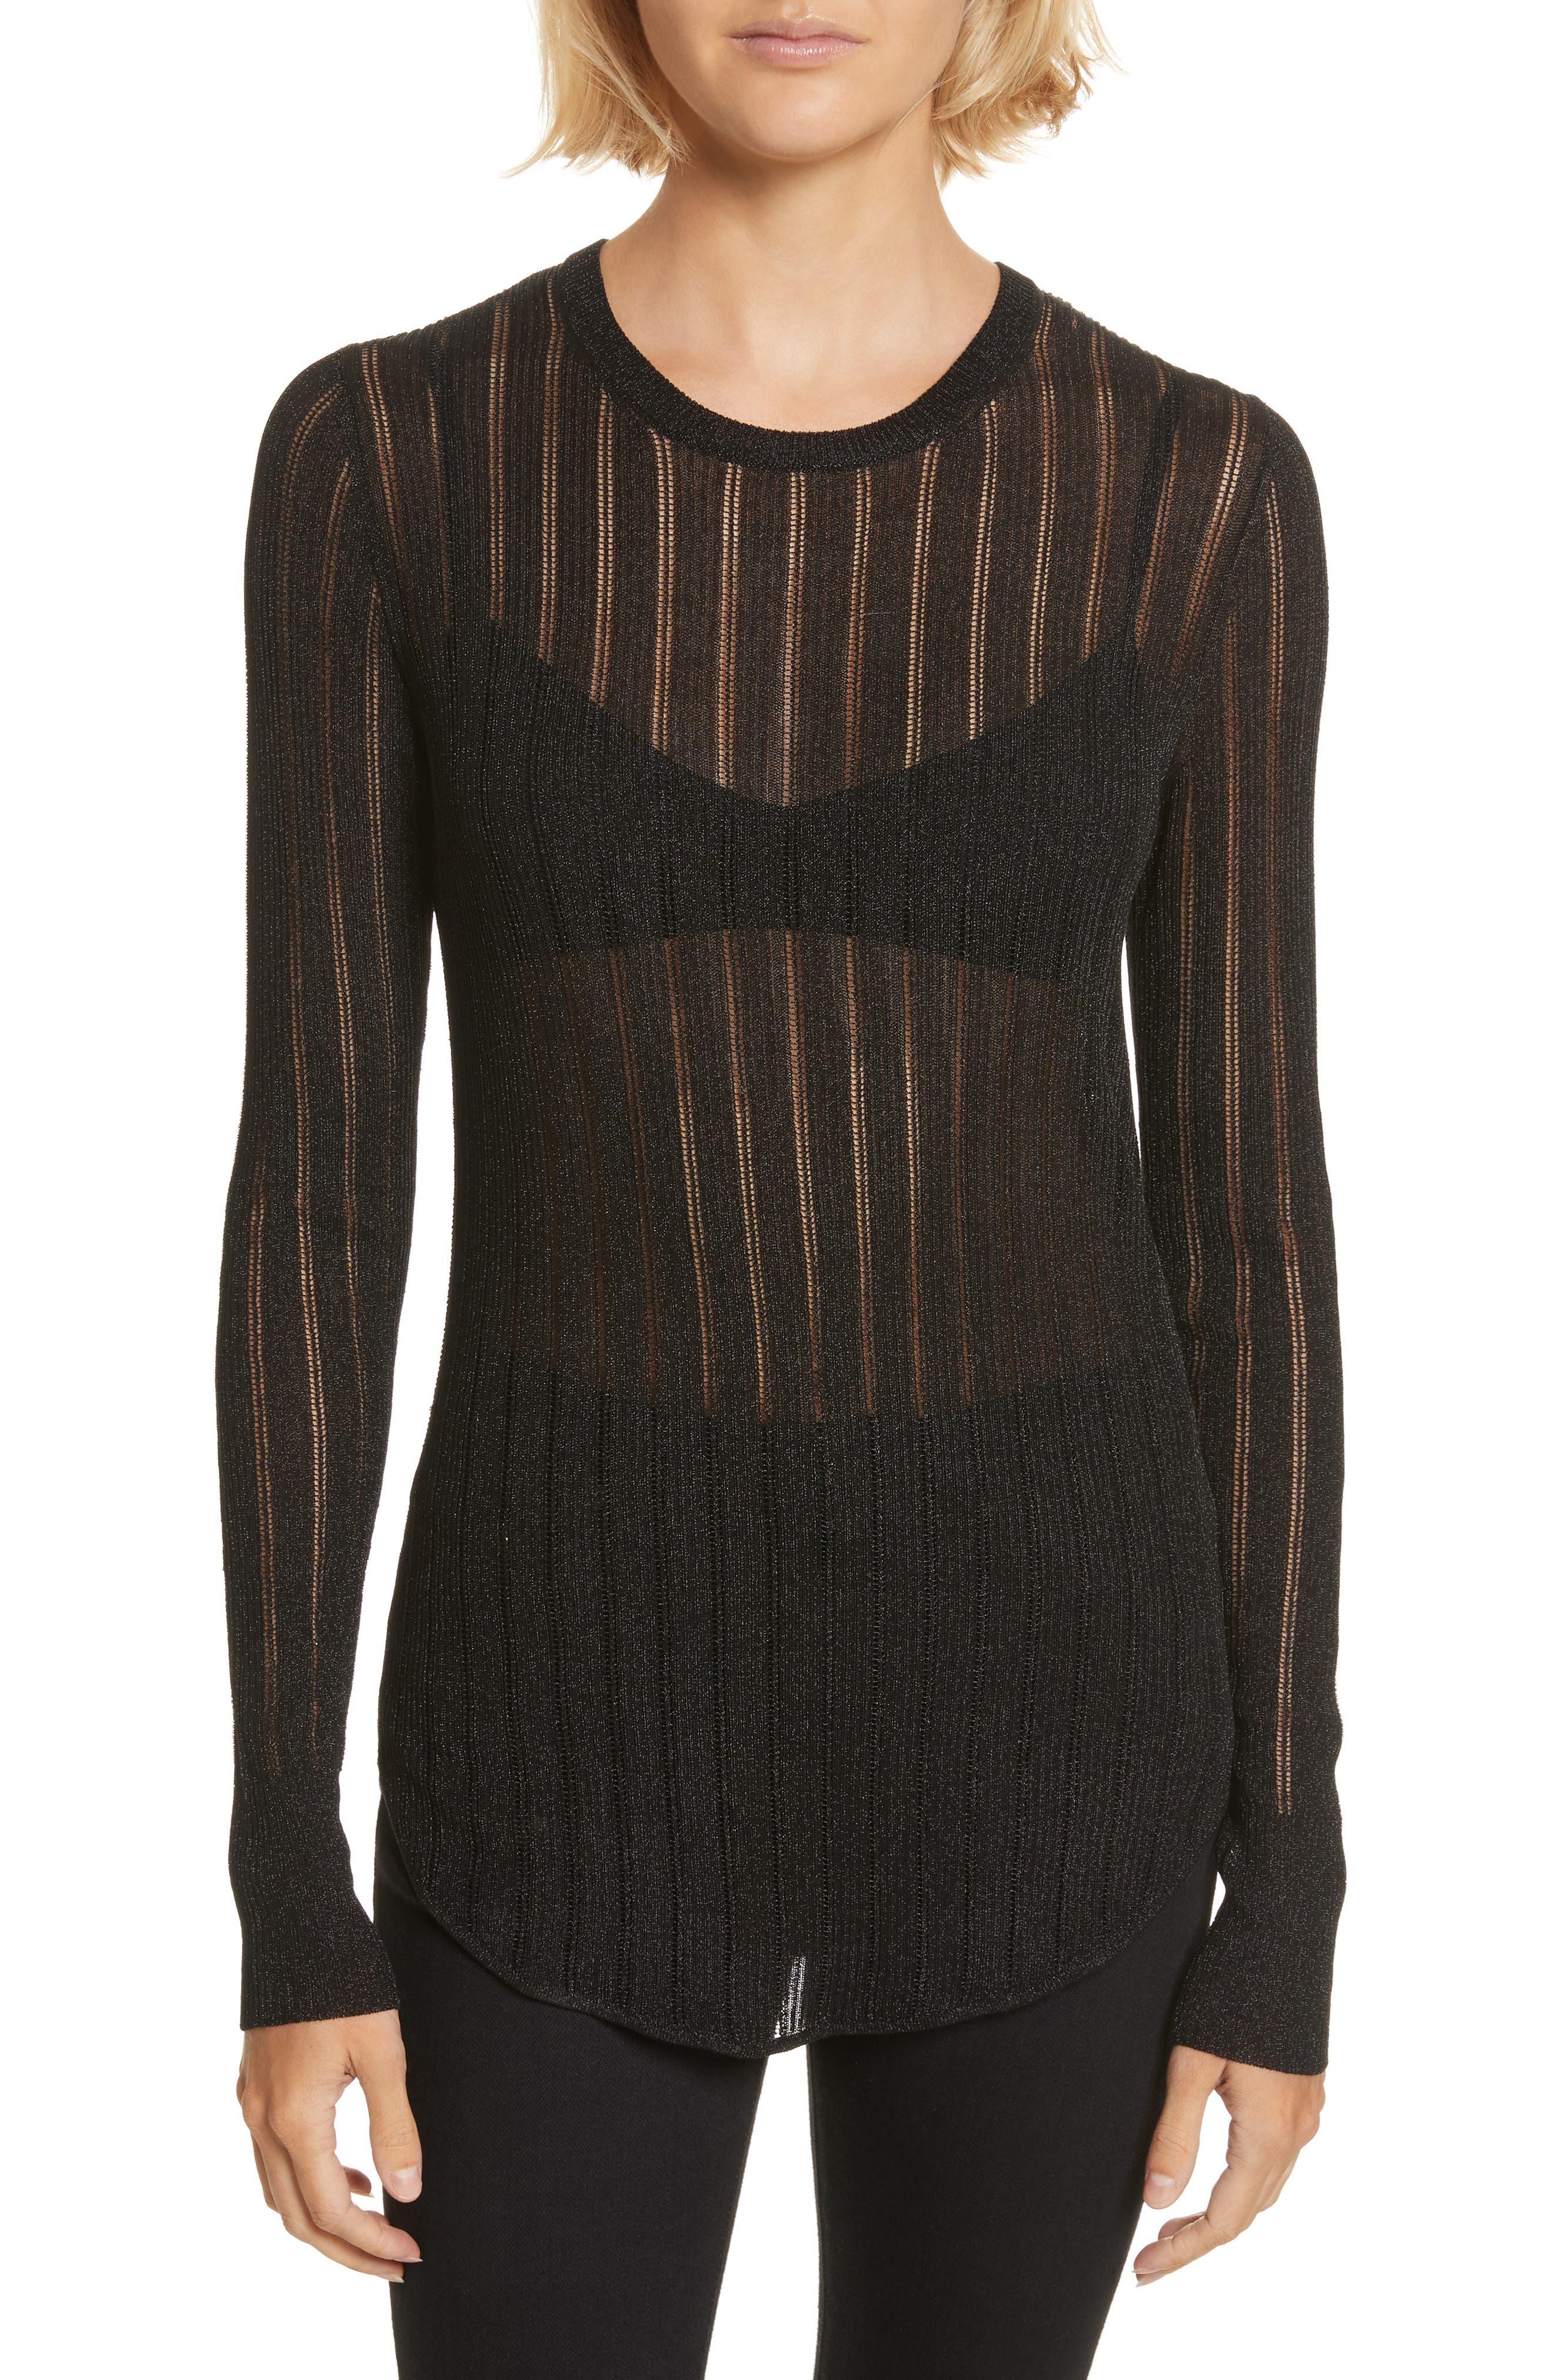 Skogkik Metallic Knit Top,                         Main,                         color, Black